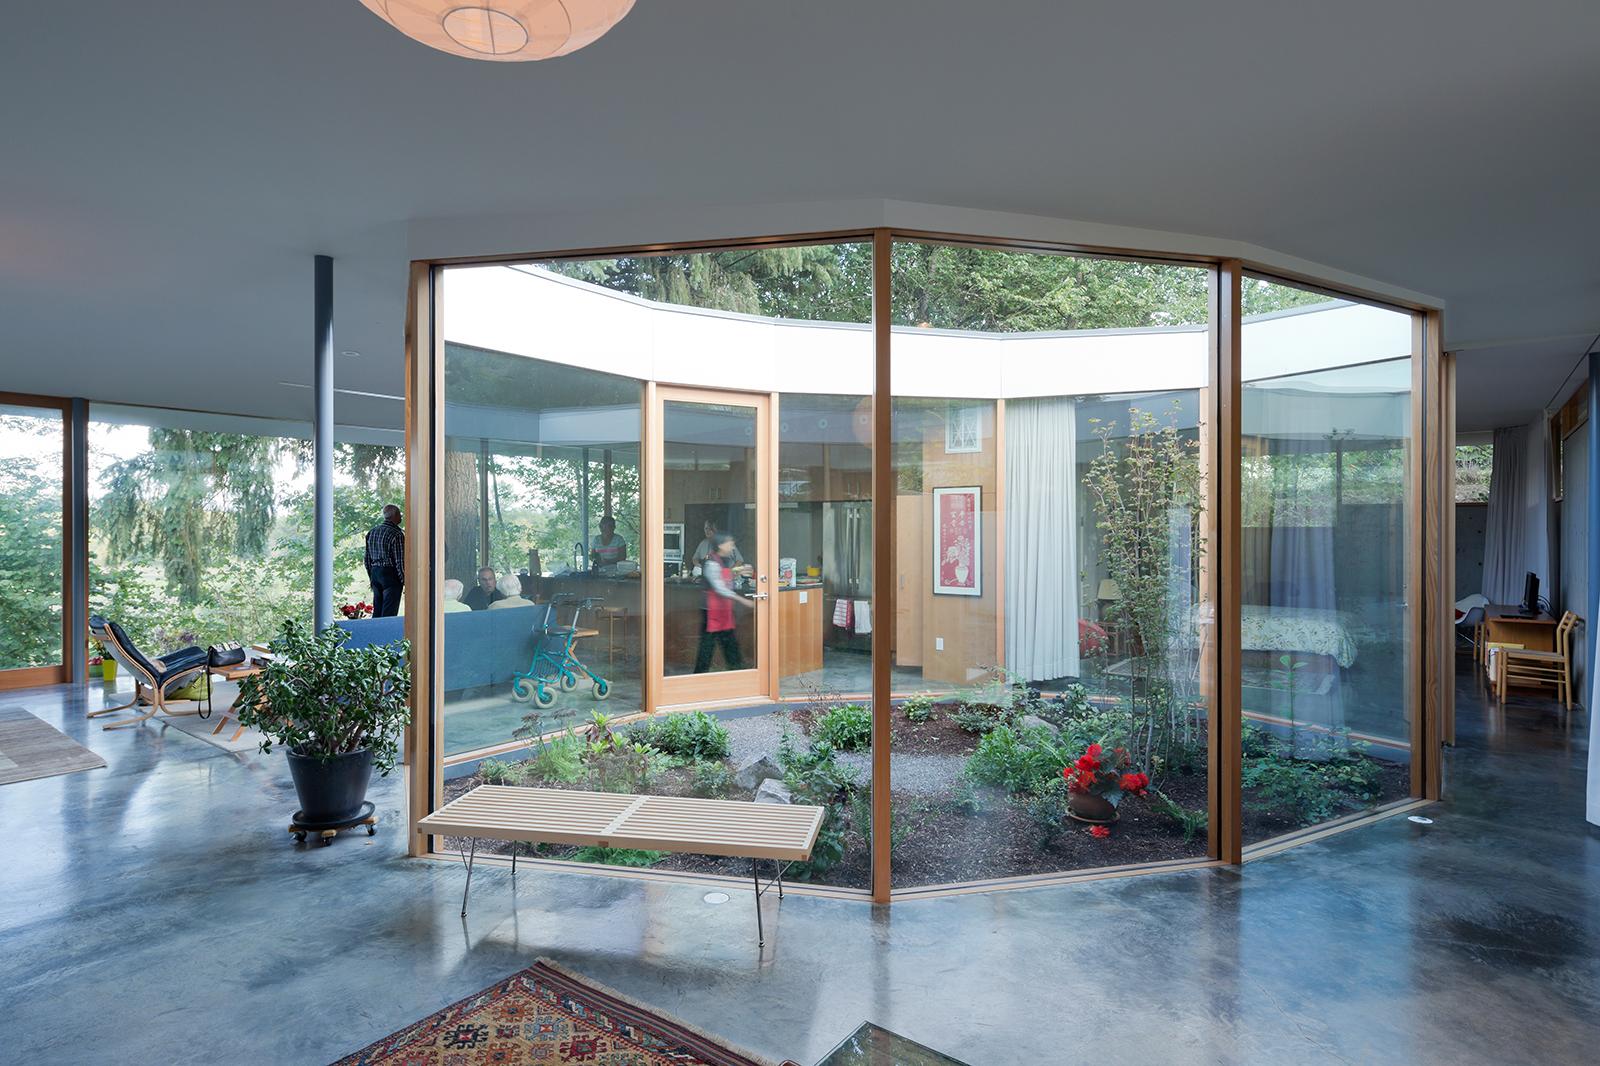 modern courtyard low-e glass wall insulation bench